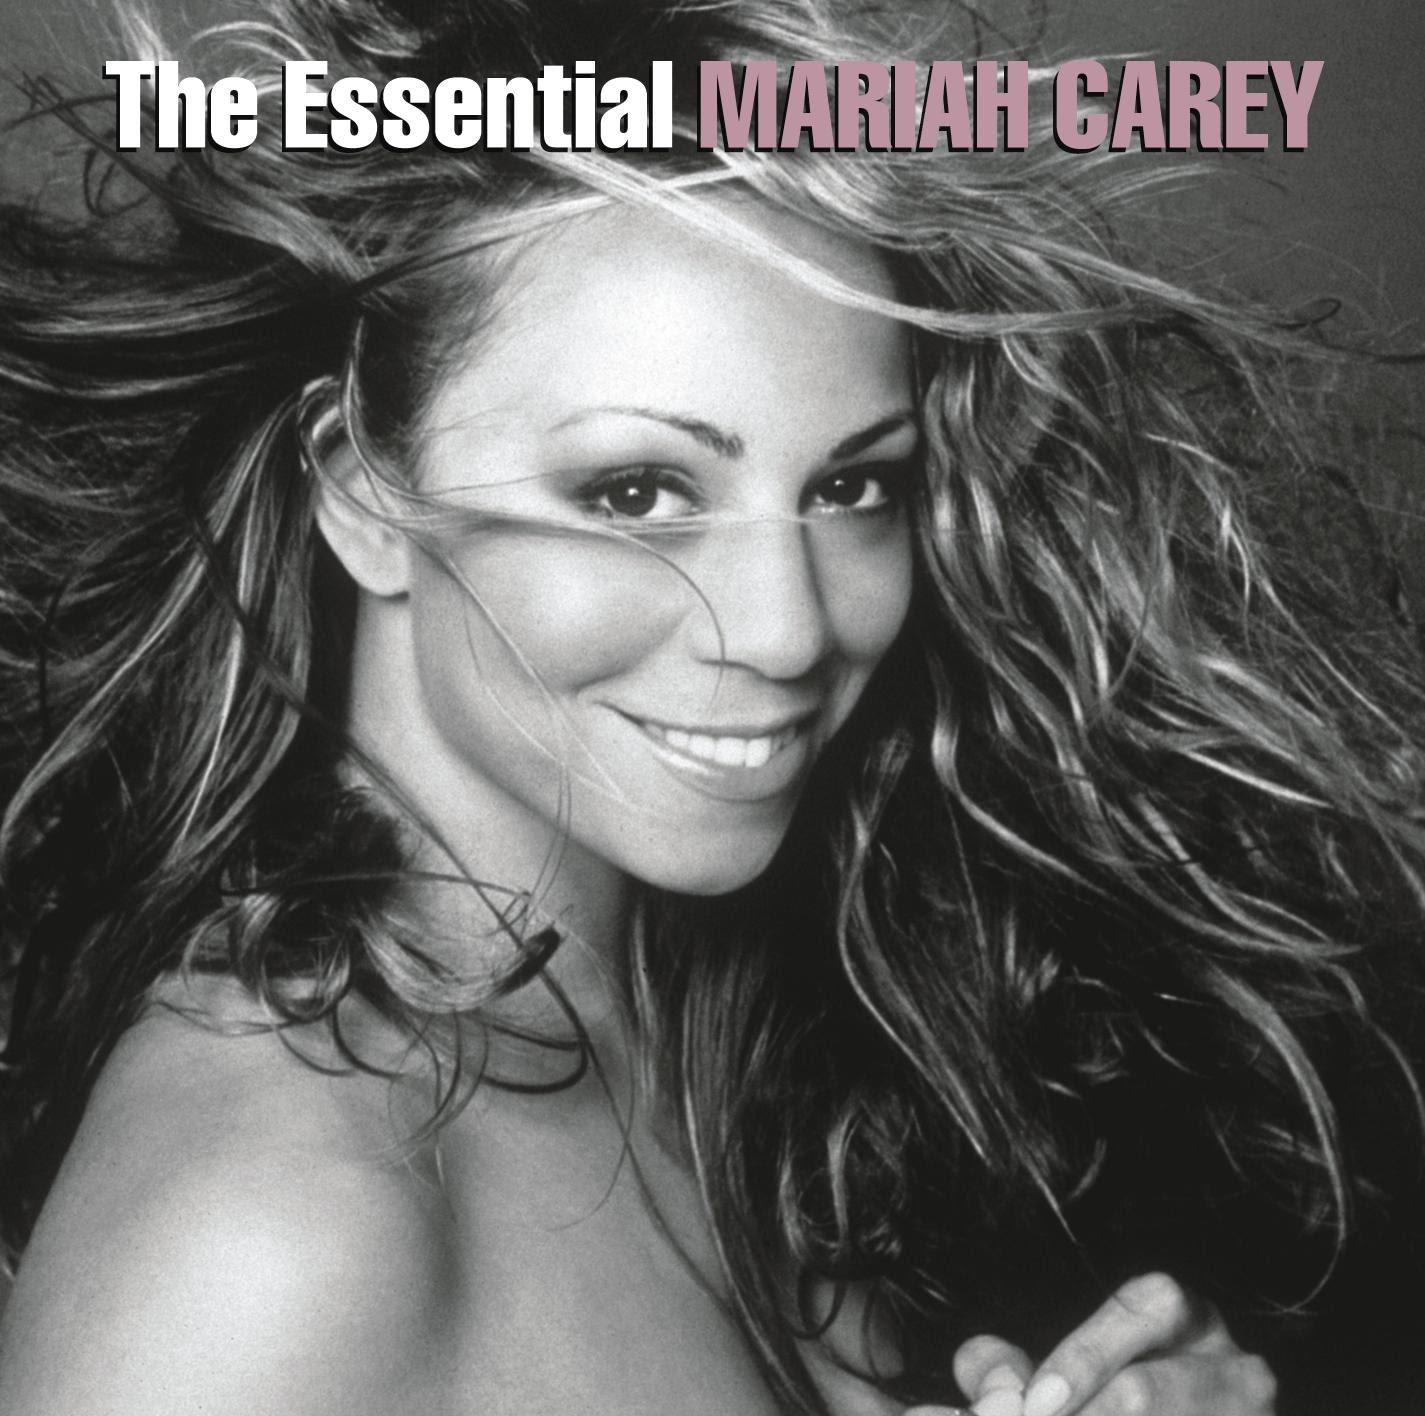 http://2.bp.blogspot.com/-ByWwLx6xou8/T8xkj4Q_mVI/AAAAAAAAE6Y/sWFONl7TsR4/s1600/essential+of+mariah+carey.bmp